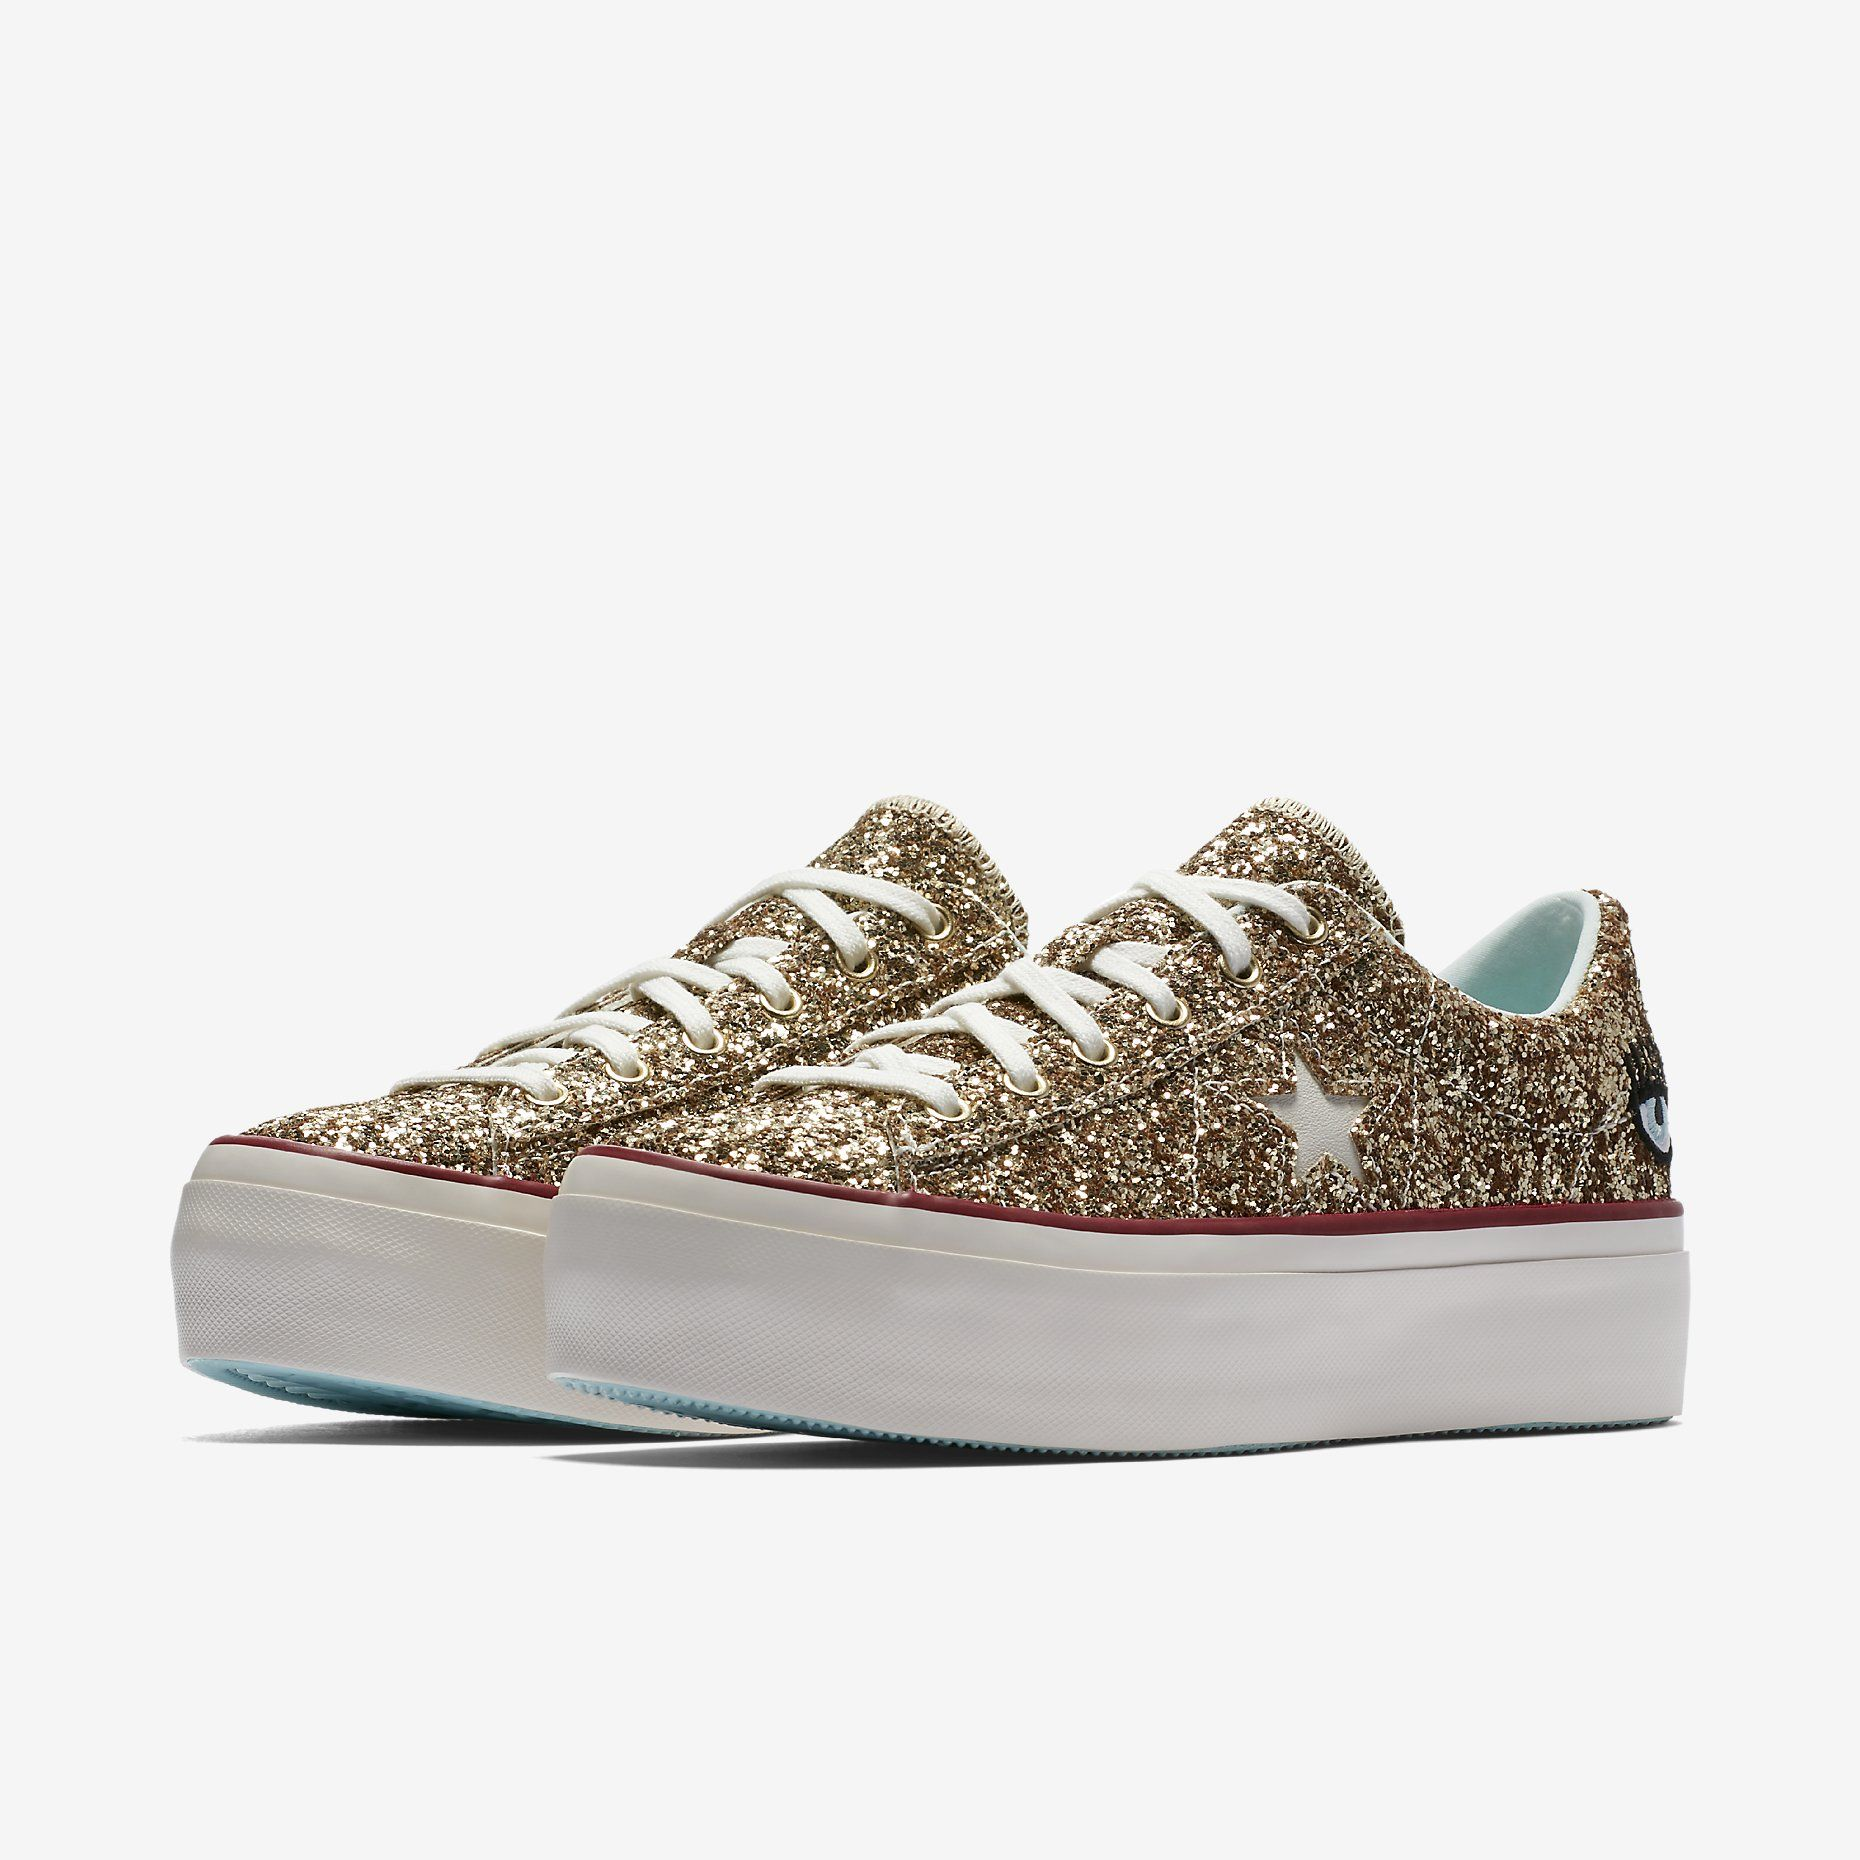 c07f7b18871d Converse x Chiara Ferragni One Star Platform Low Top Women s Shoe. Nike.com